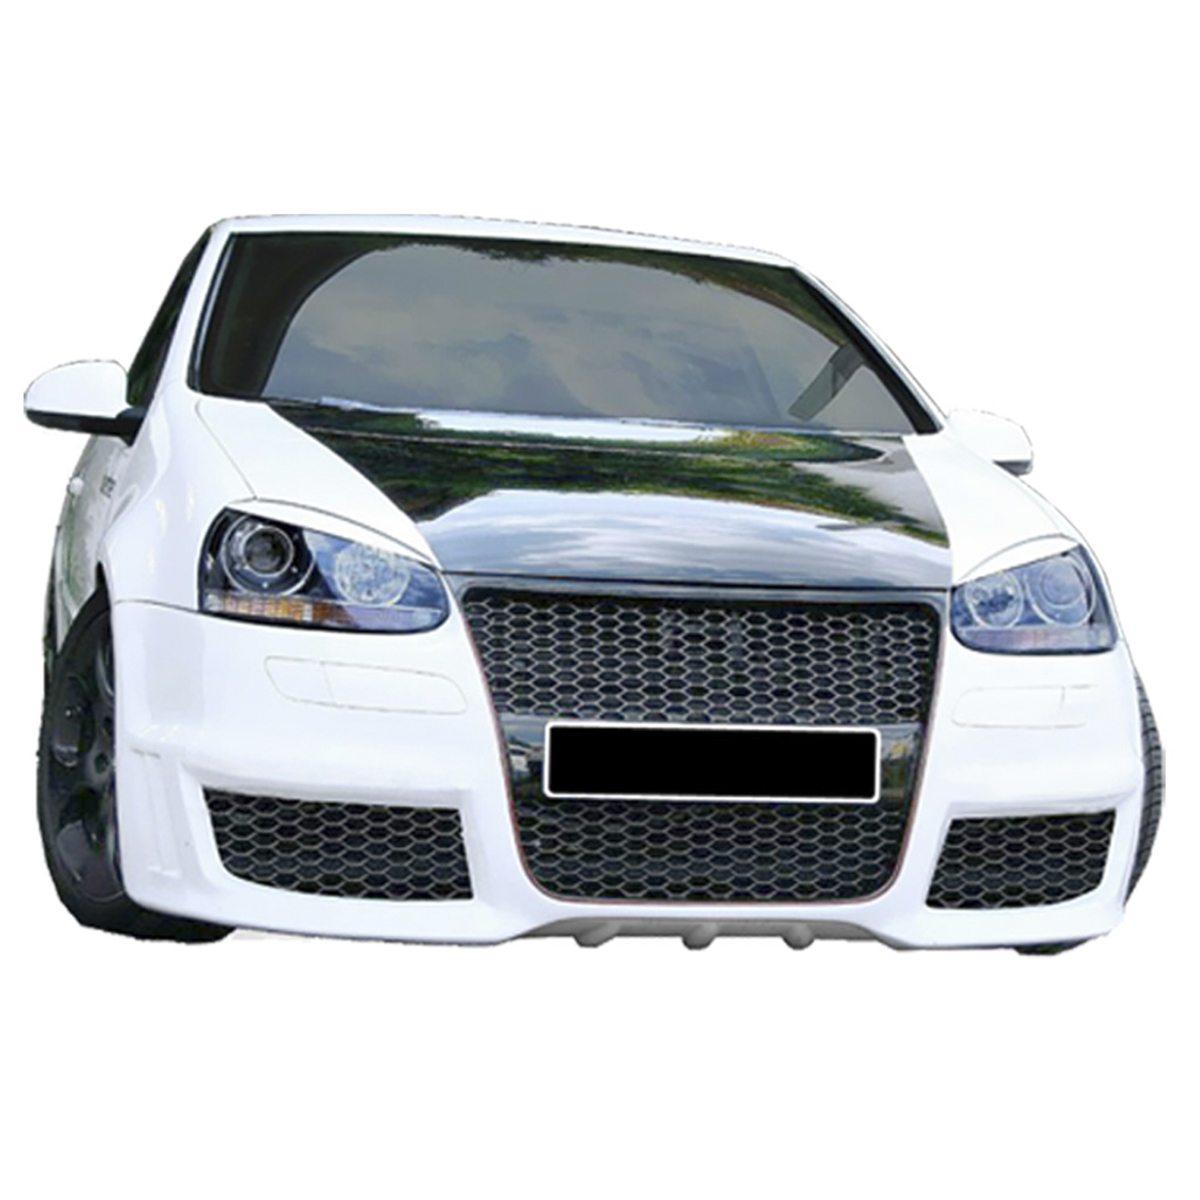 VW-Golf-V-Power-Frt-PCF015